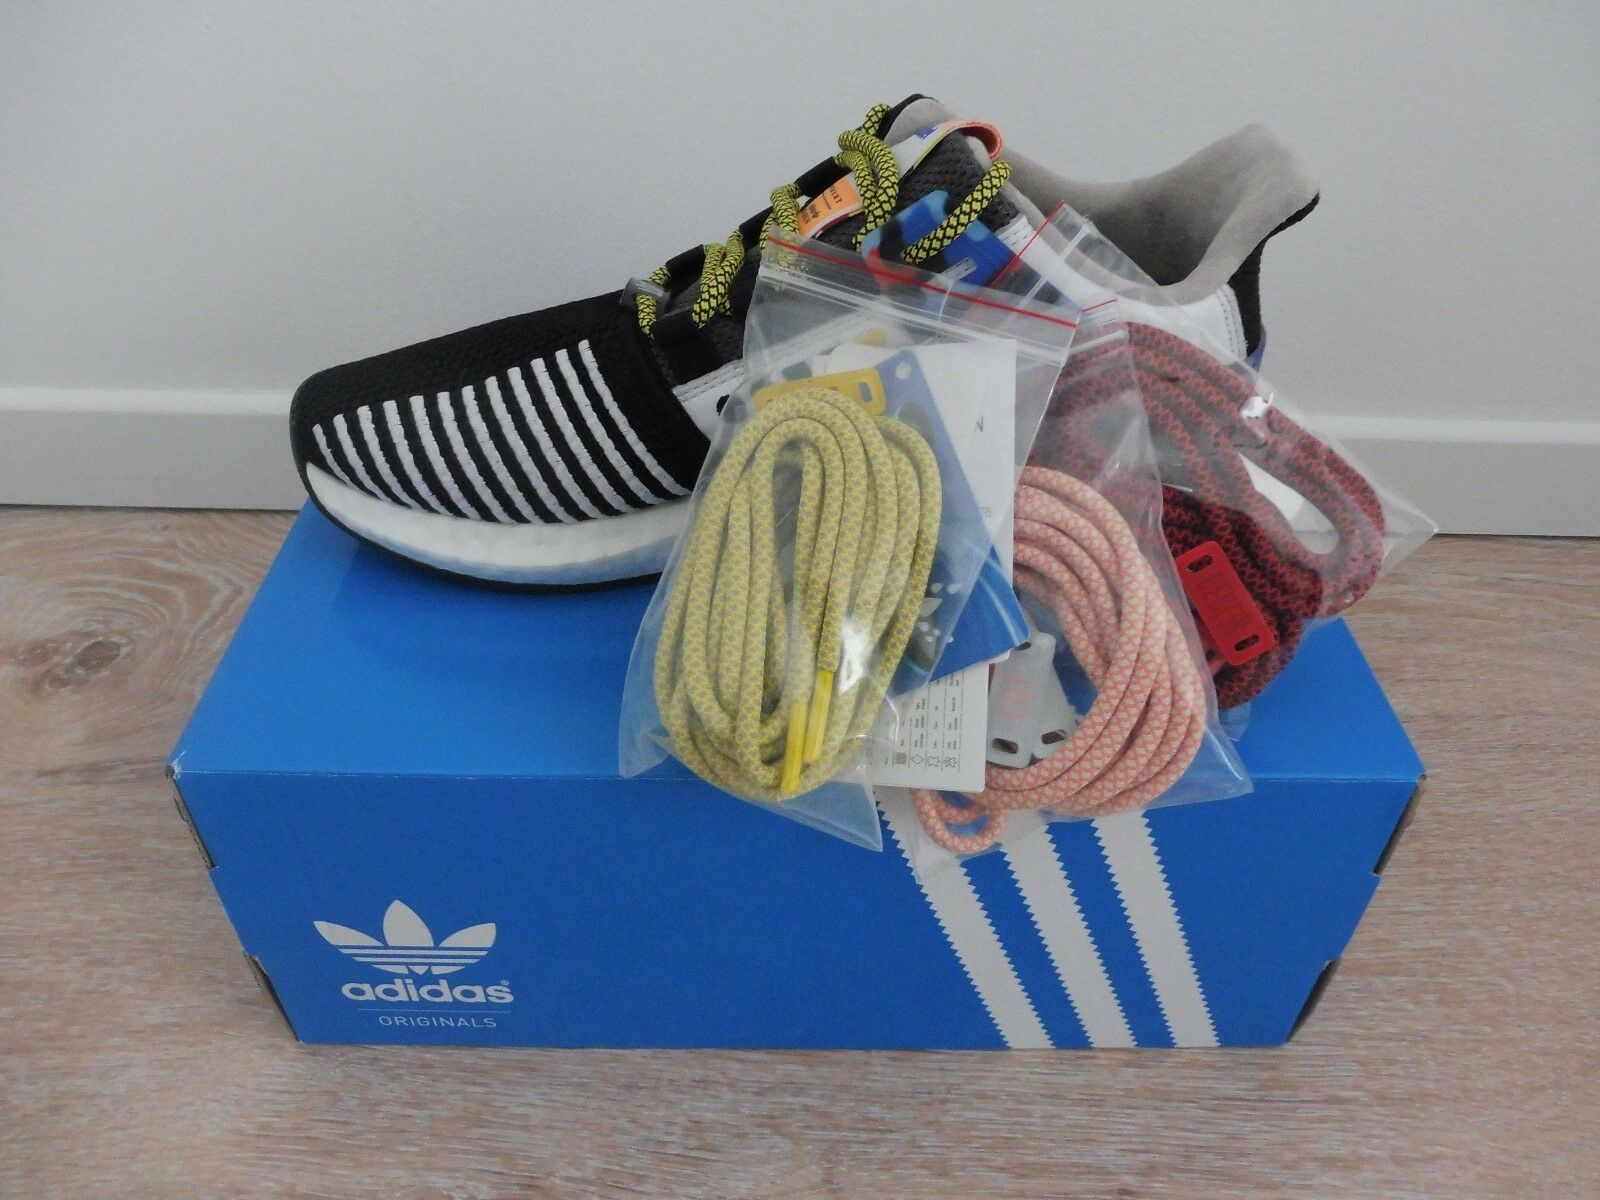 Adidas EQT Support 93 Berlin / BVG Limited Edition 422/500 NEU/OVP EU42